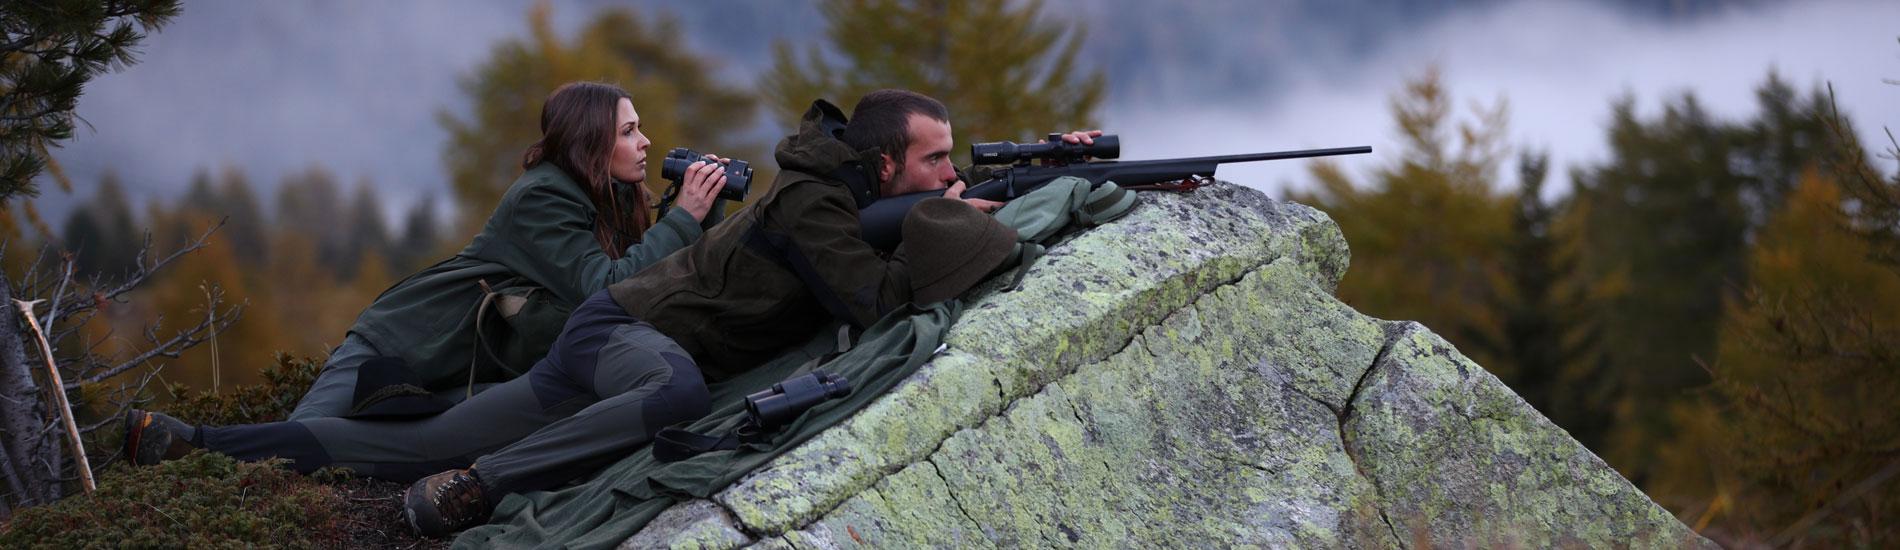 carabine da caccia Bolt action Franchi Horizon fucili